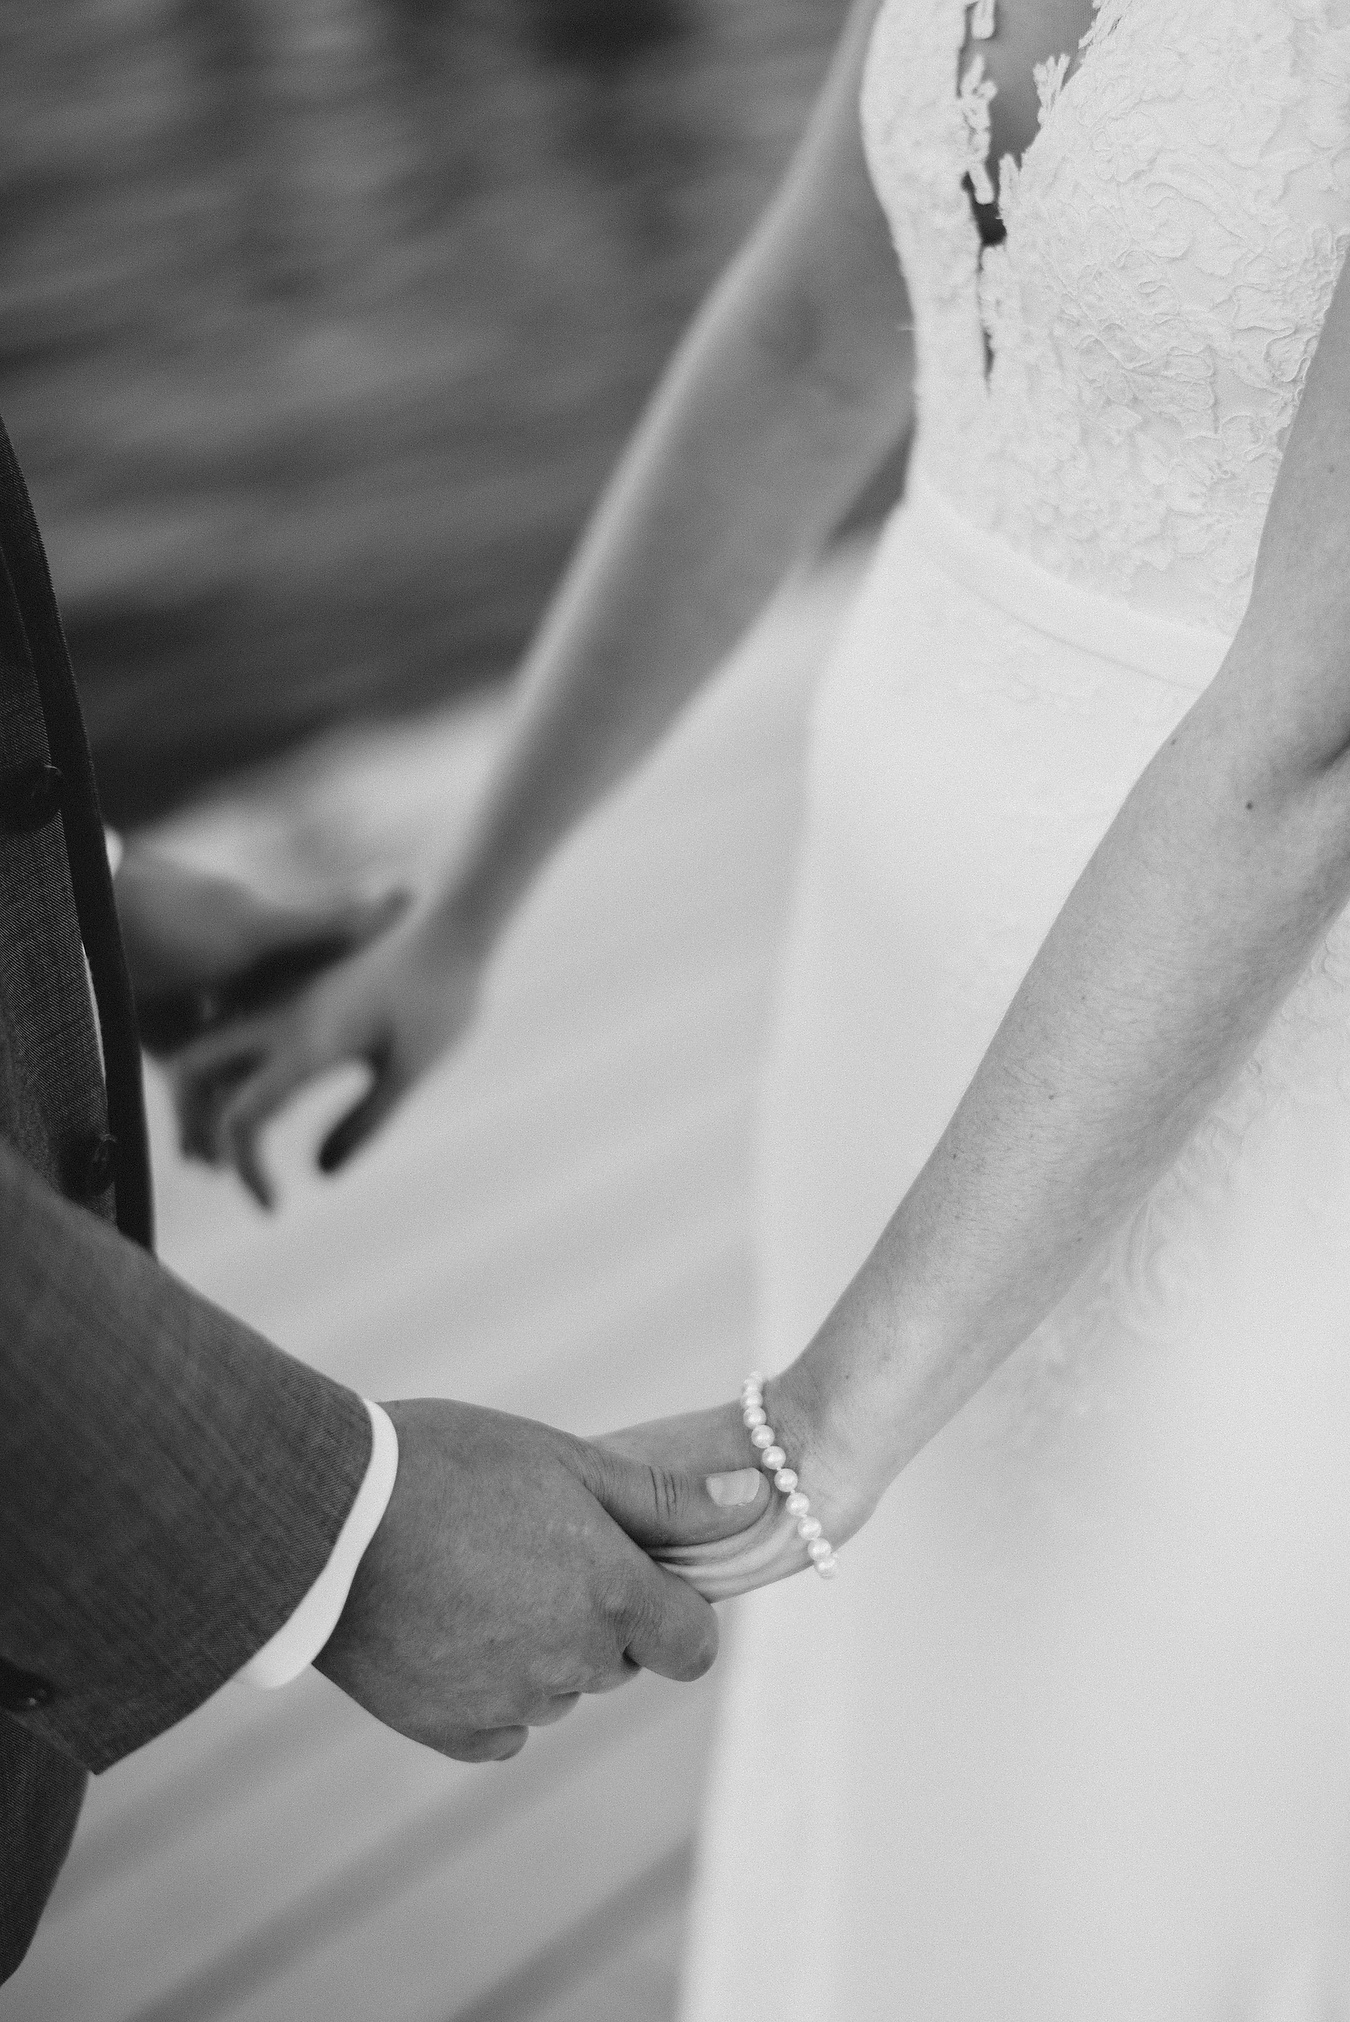 eastern_yacht_club_wedding_photos_marblehead_37.JPG